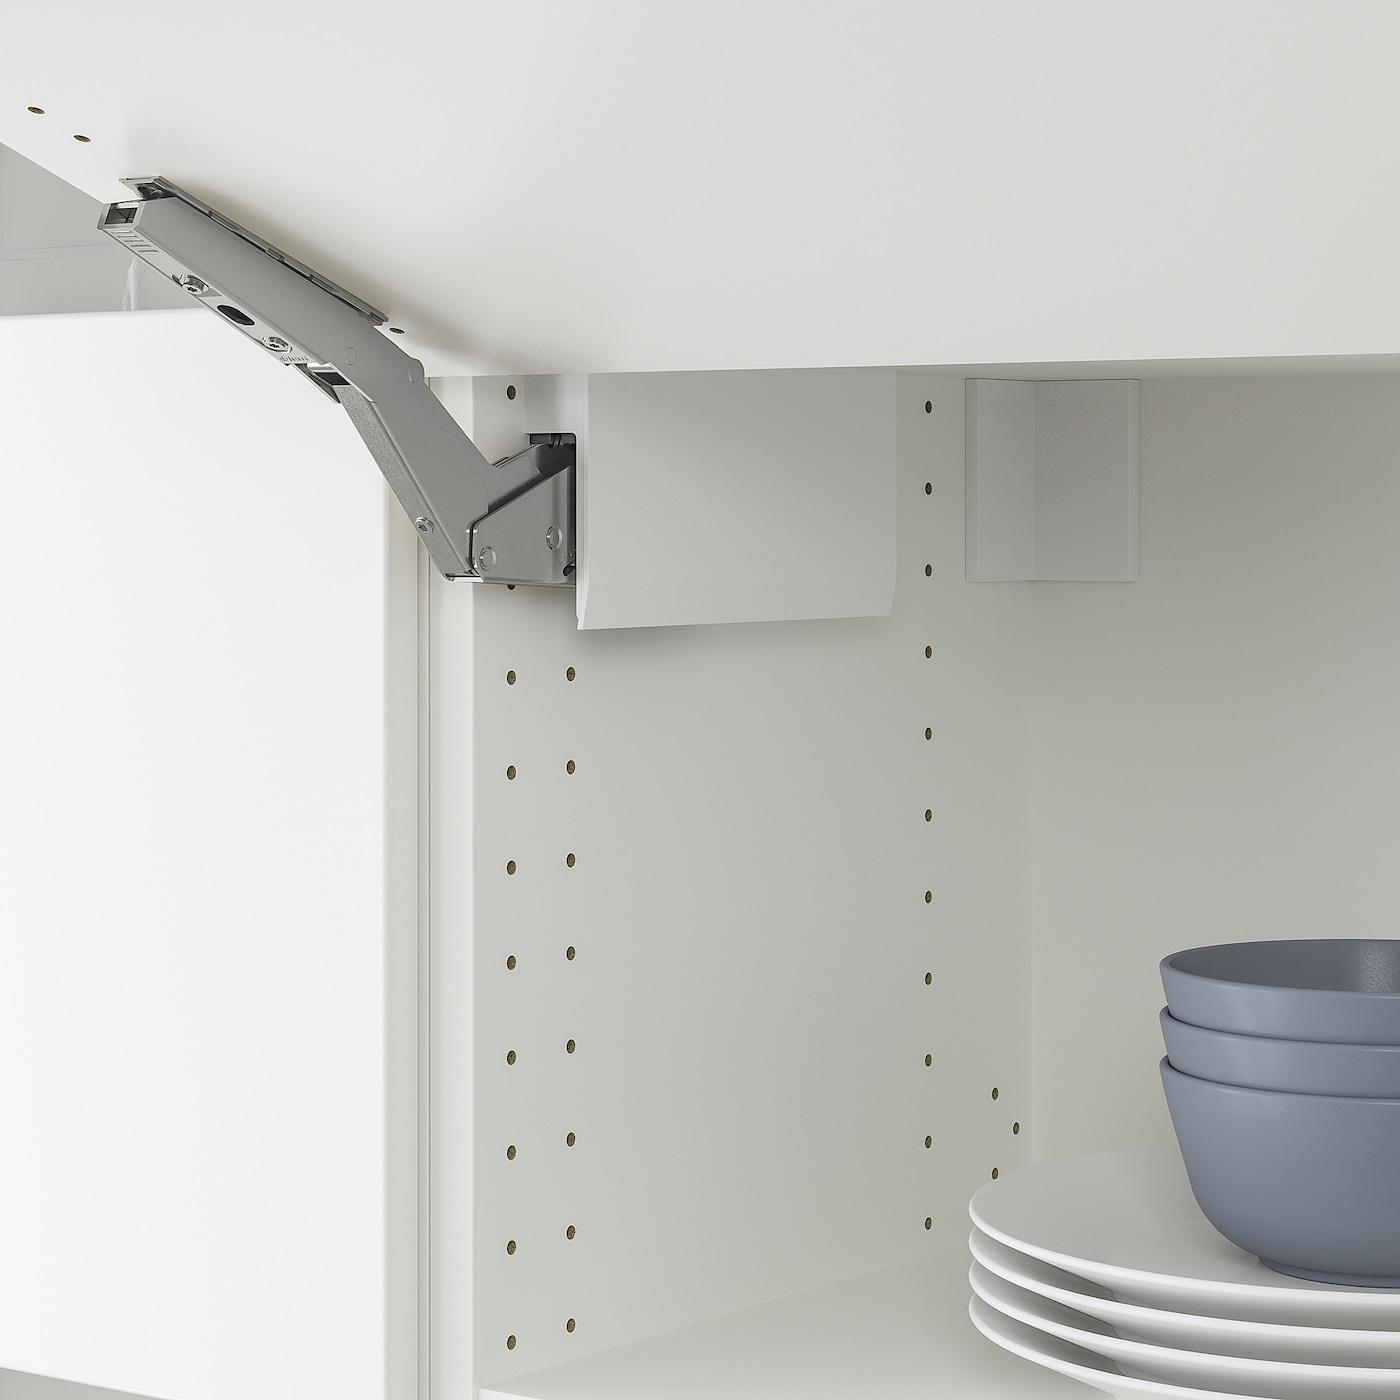 3 PAIR Modern IKEA UTRUSTA Horizontal Cabinet  Door Hinge Soft Close 402.794.77